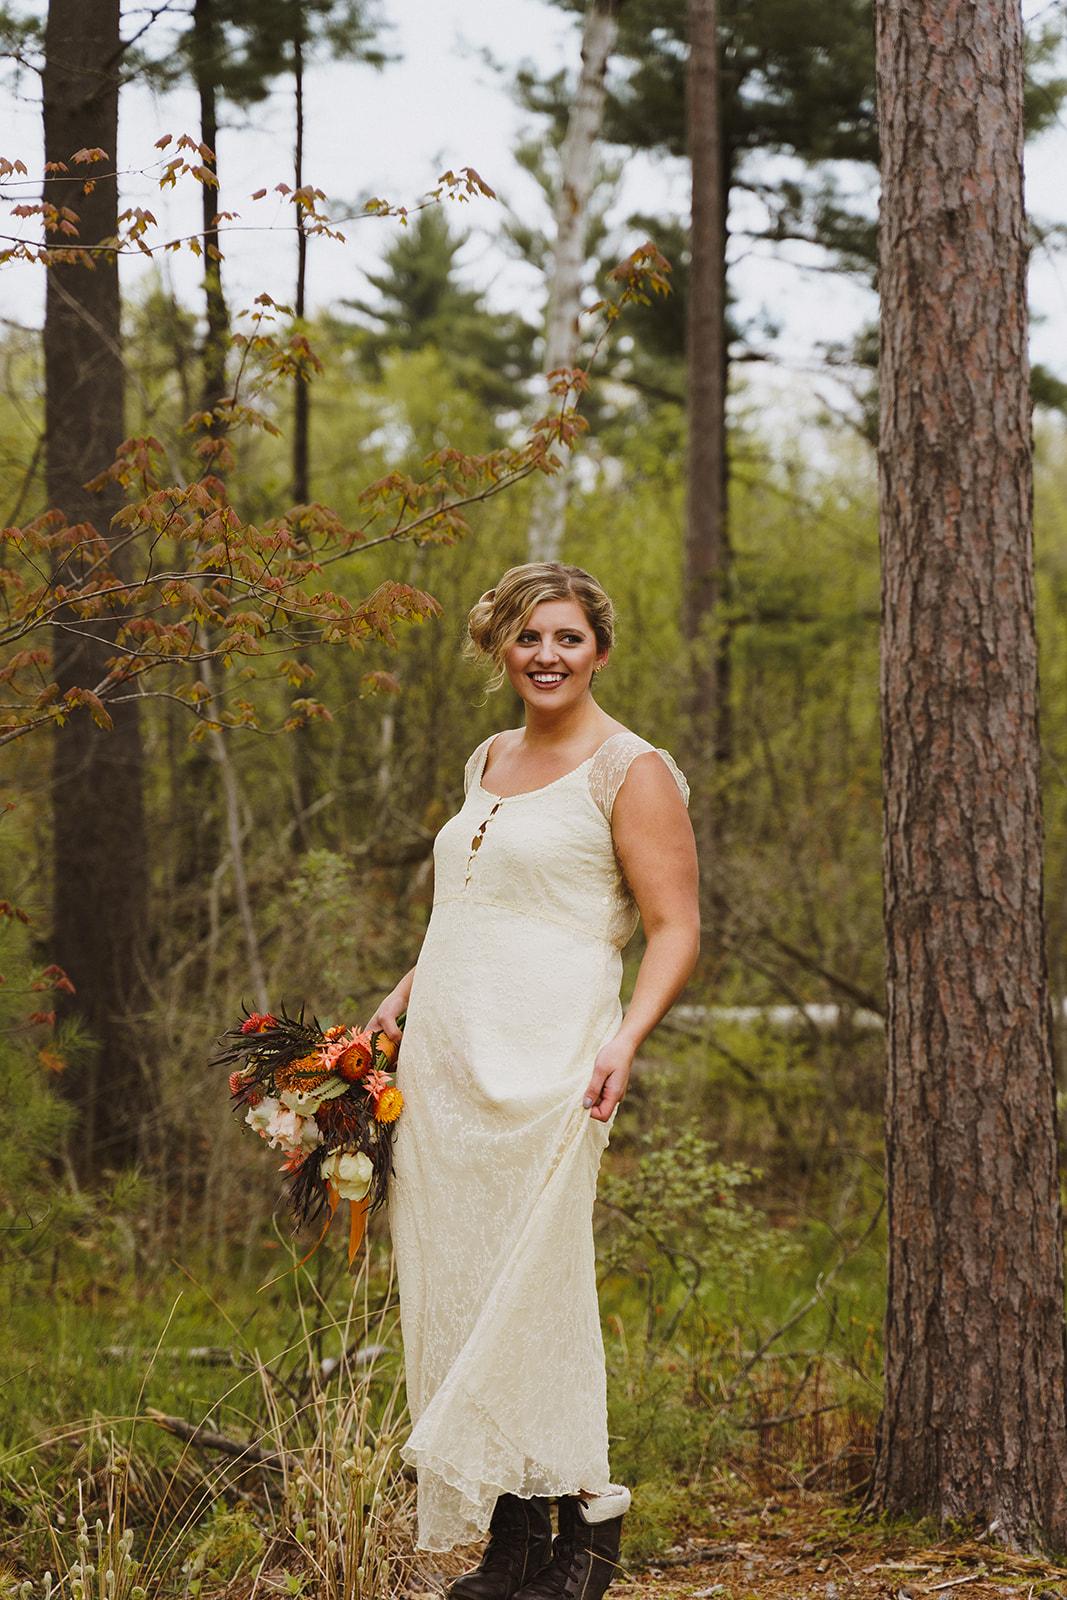 Tuckaway Tree Farm Lebanon Maine Wedding Inspiration 75